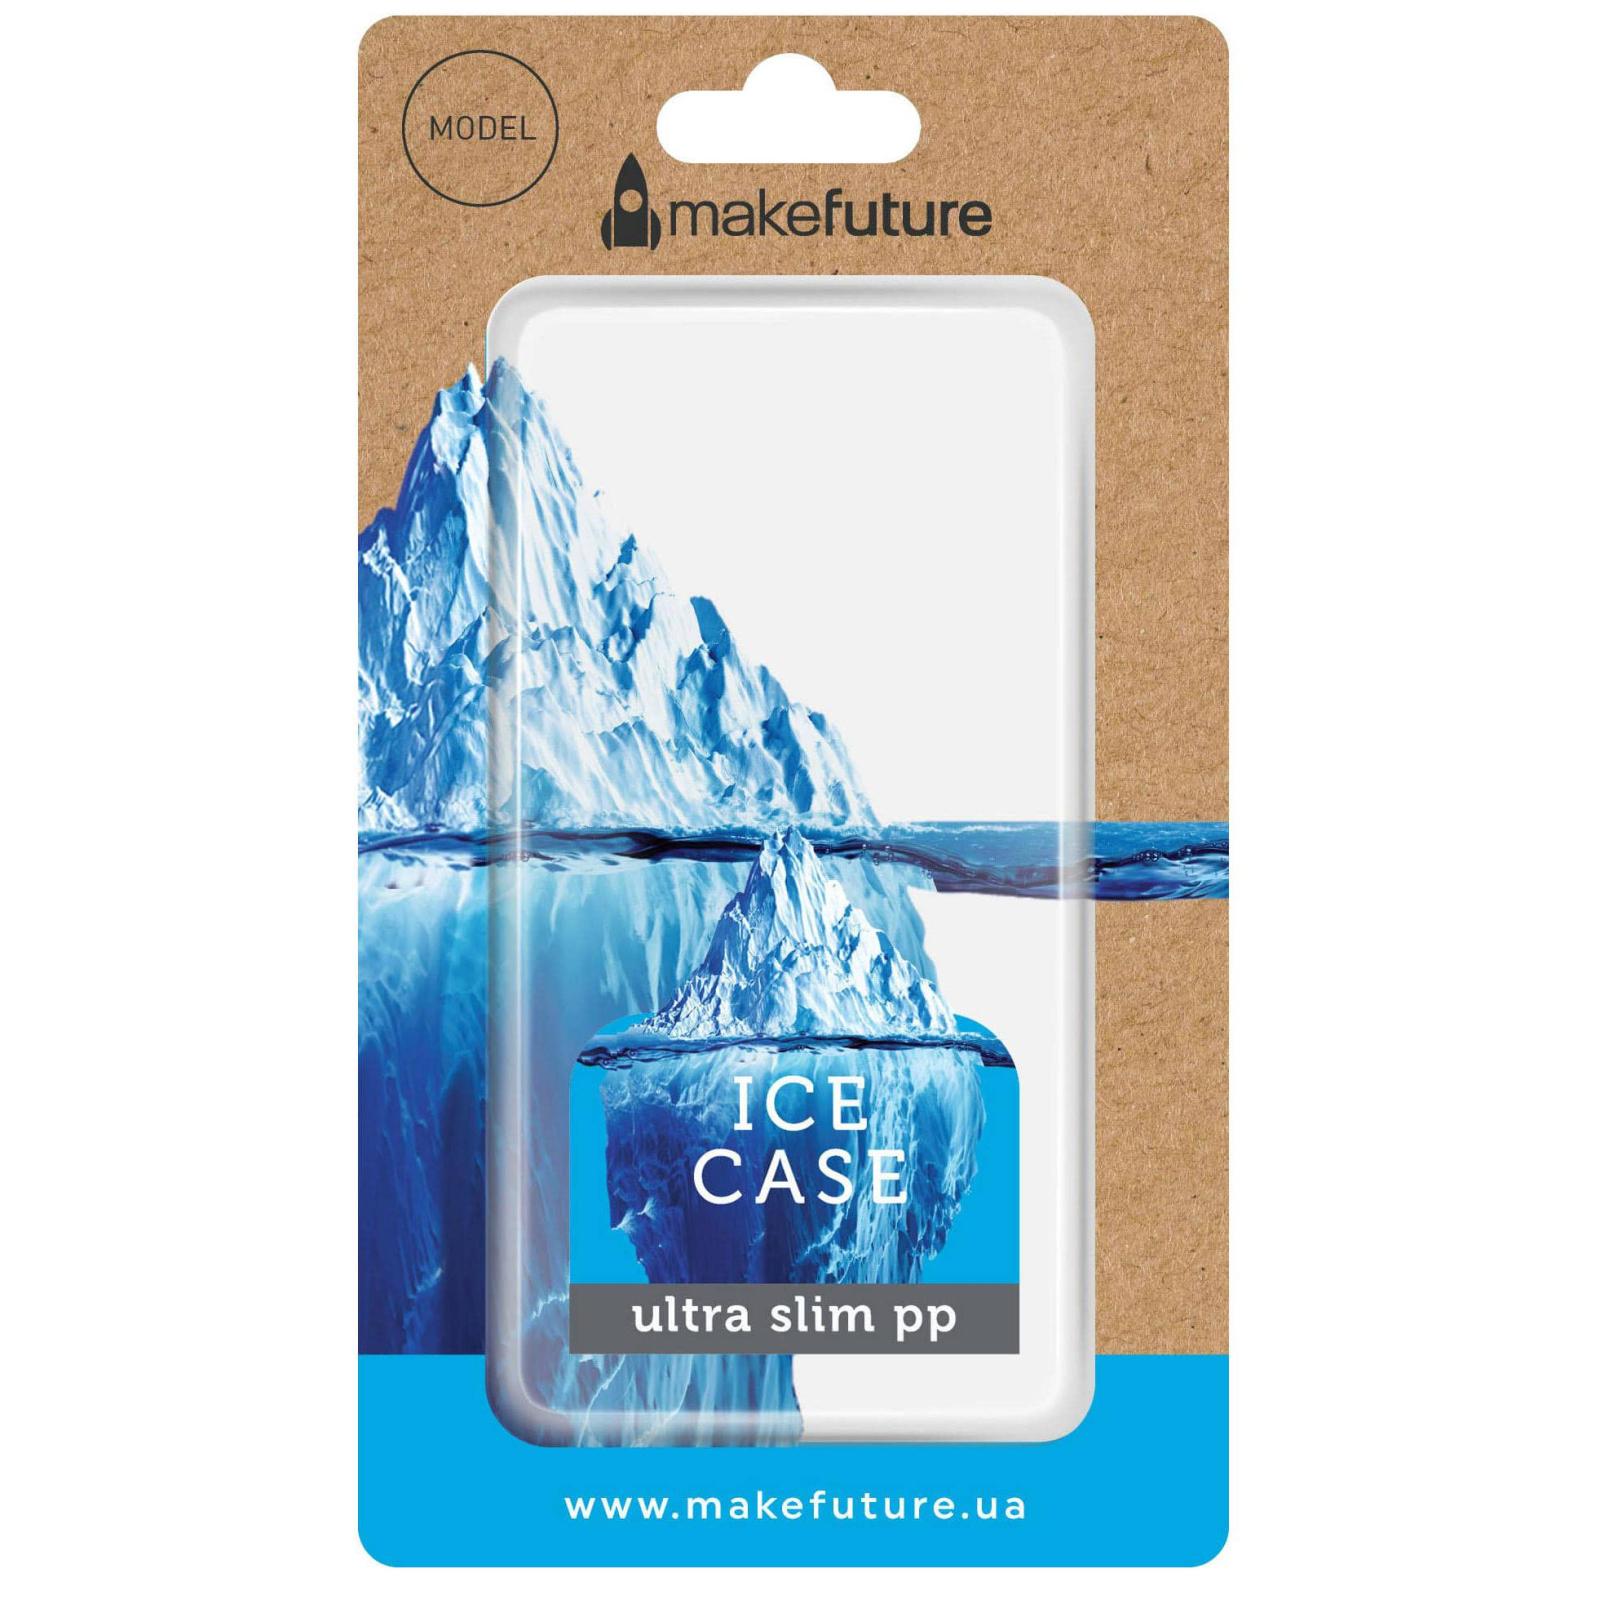 Чехол для моб. телефона MakeFuture Ice Case (PP) для Apple iPhone X White (MCI-AIXWH) изображение 4